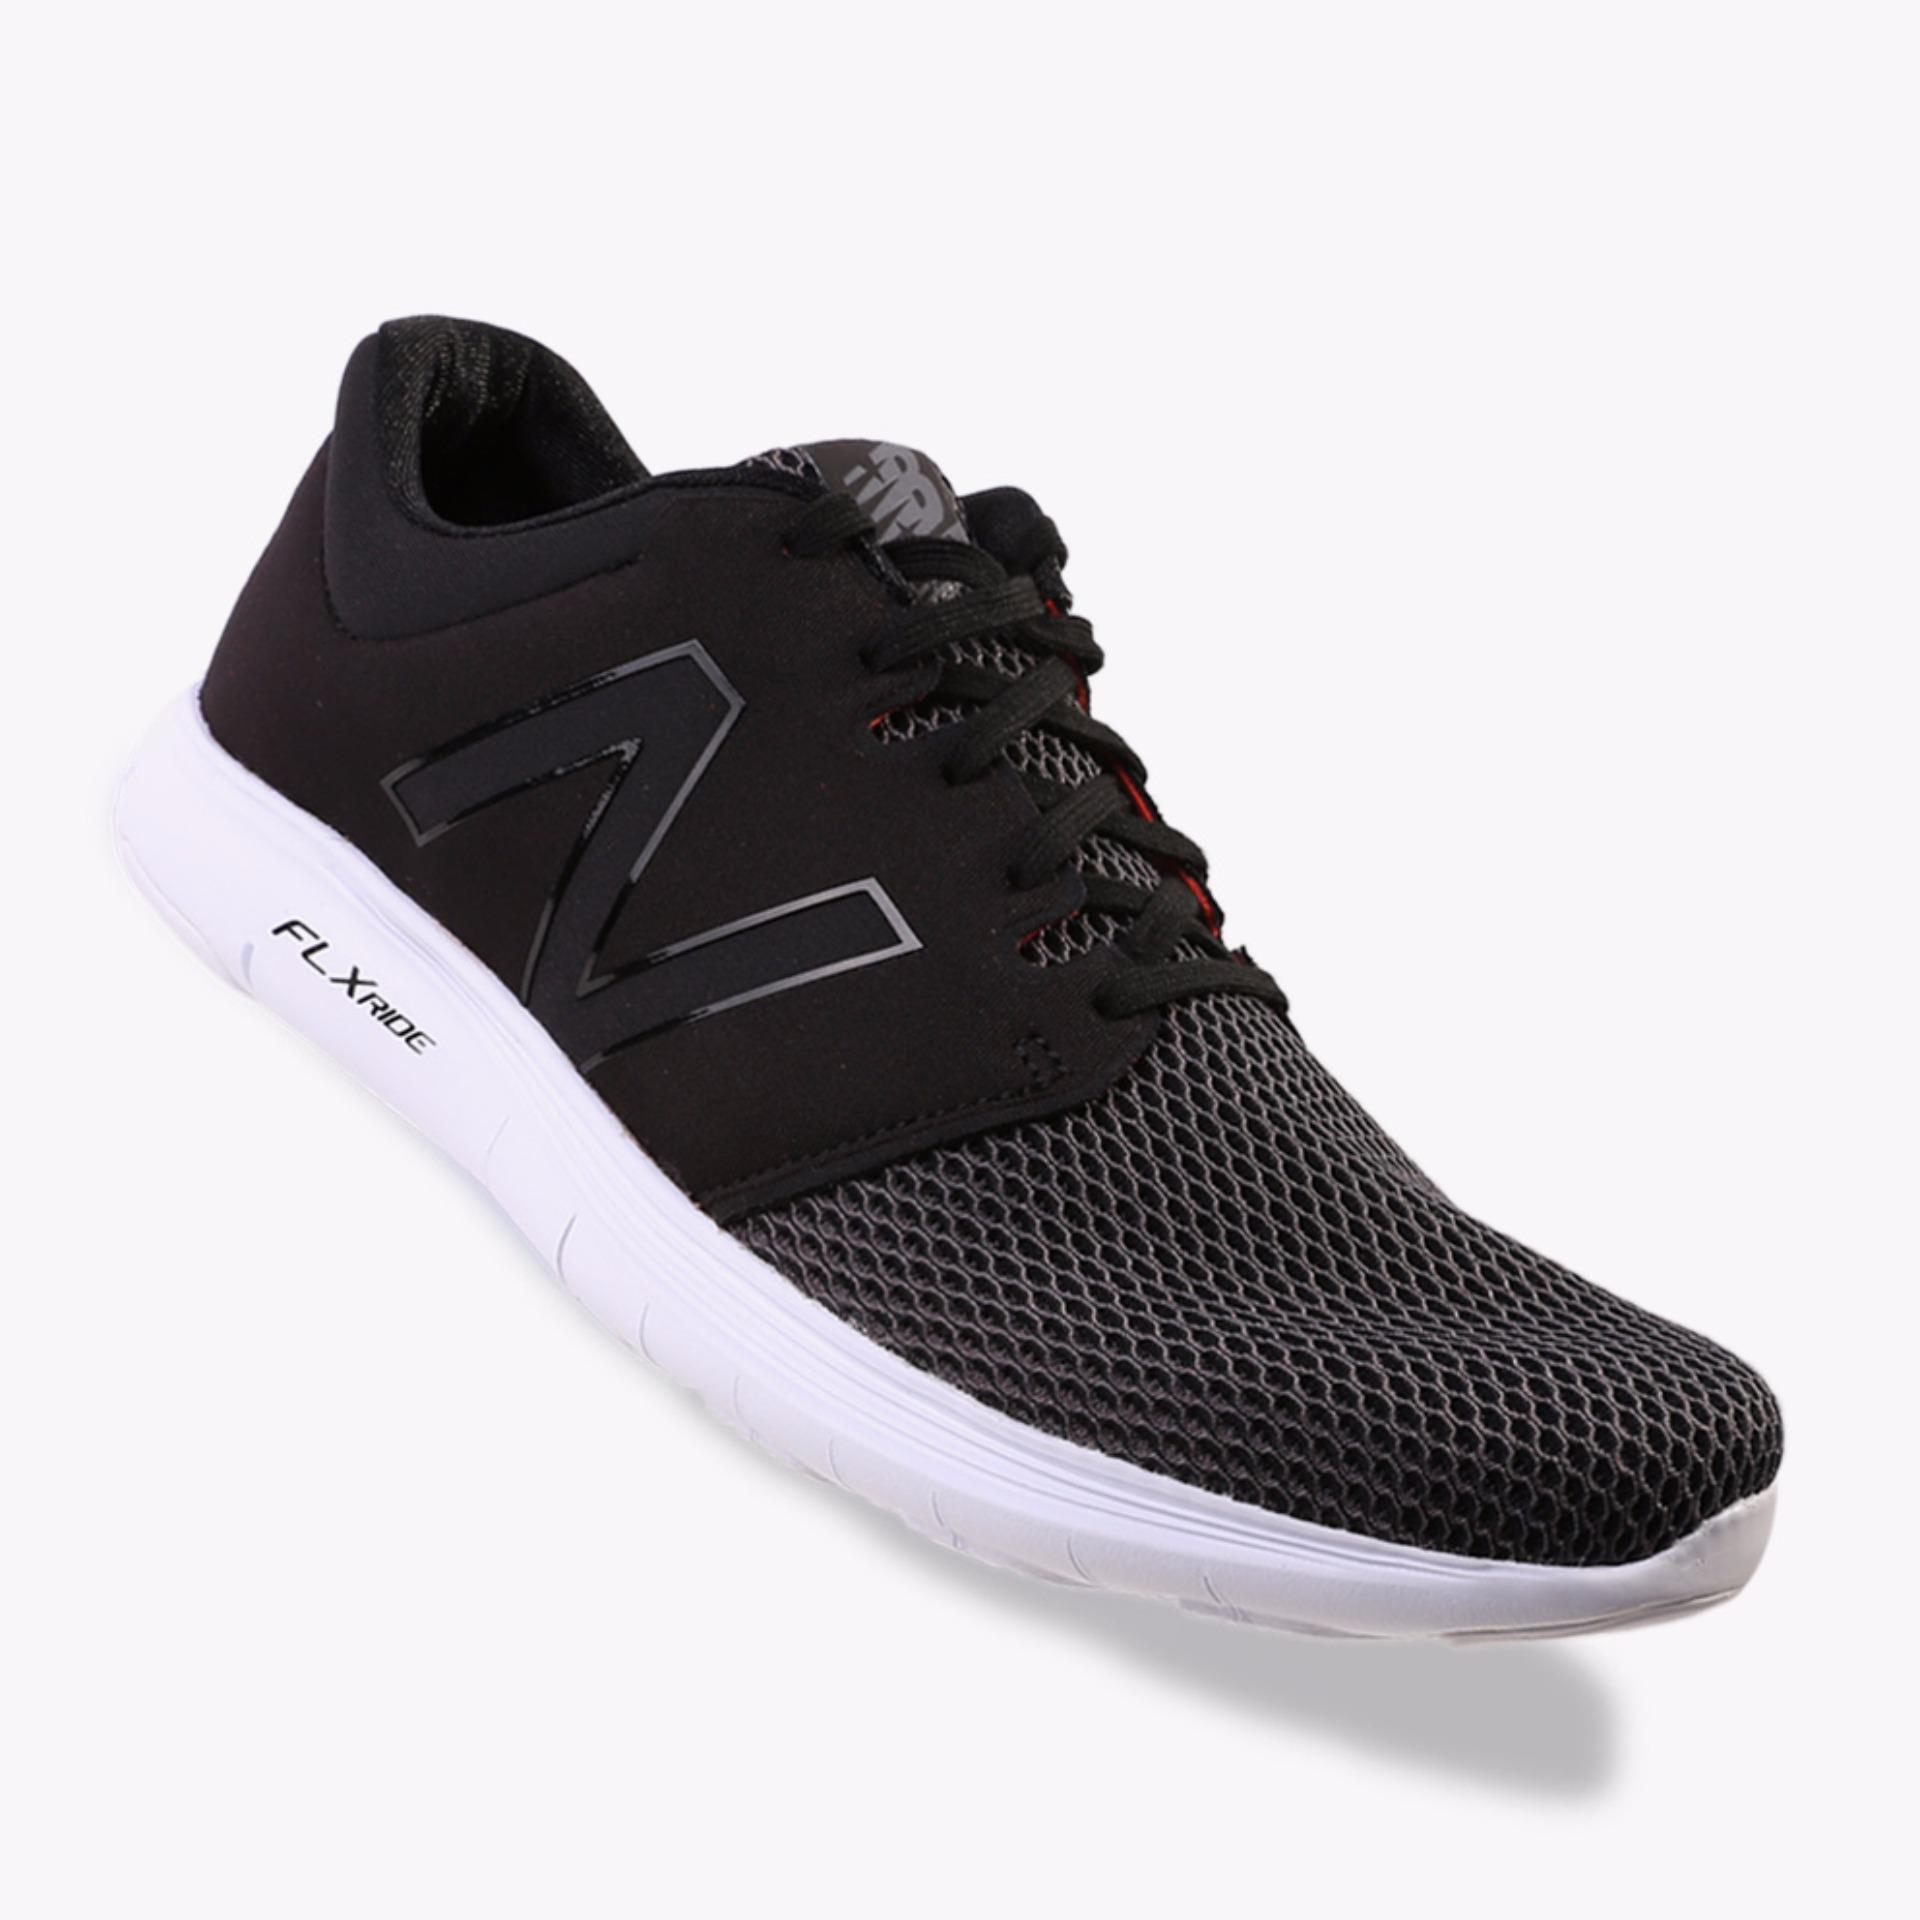 Spek New Balance Flex Ride 530 V2 Men S Running Shoes Abu Abu